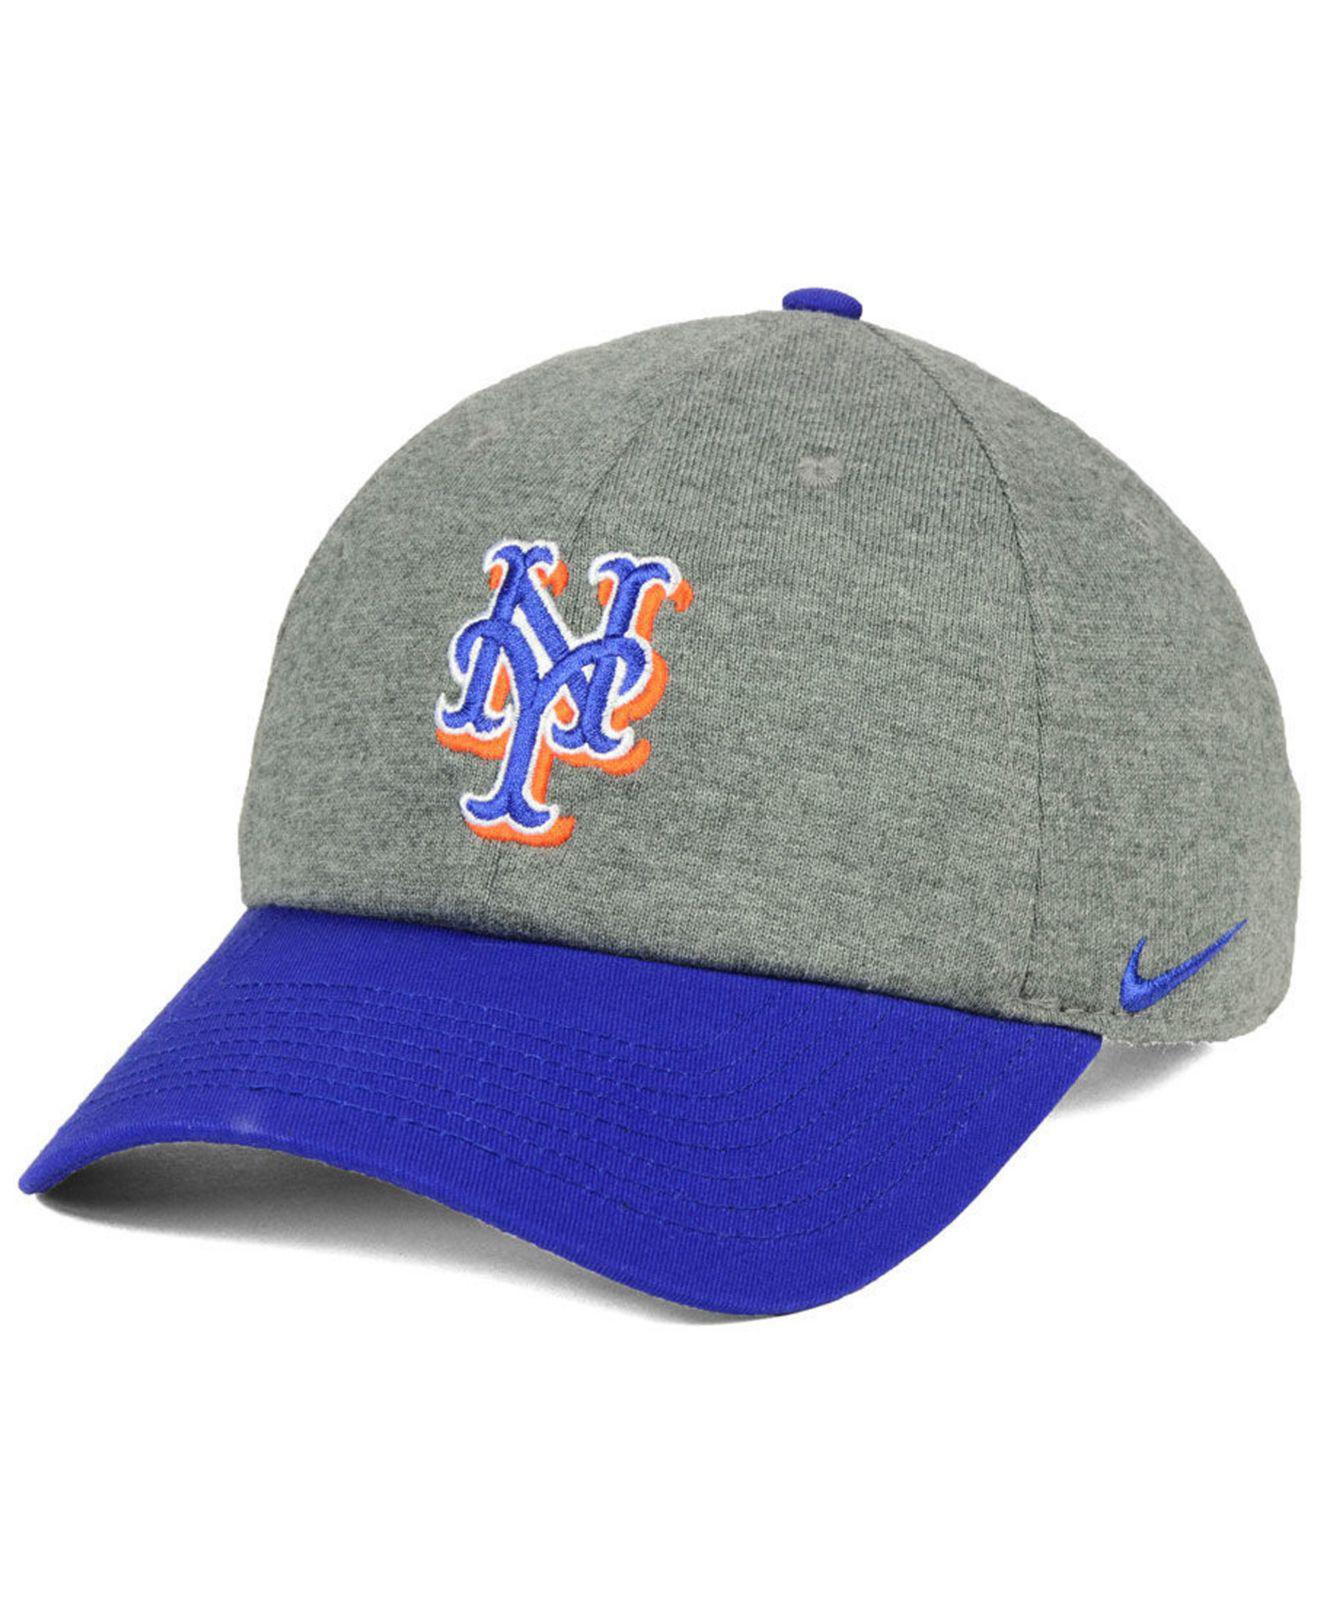 ba0dca69bfa ... hat c2d1e 5c233 shopping lyst nike new york mets 2 tone heather cap in  gray for men 86c4c 7e240 ...